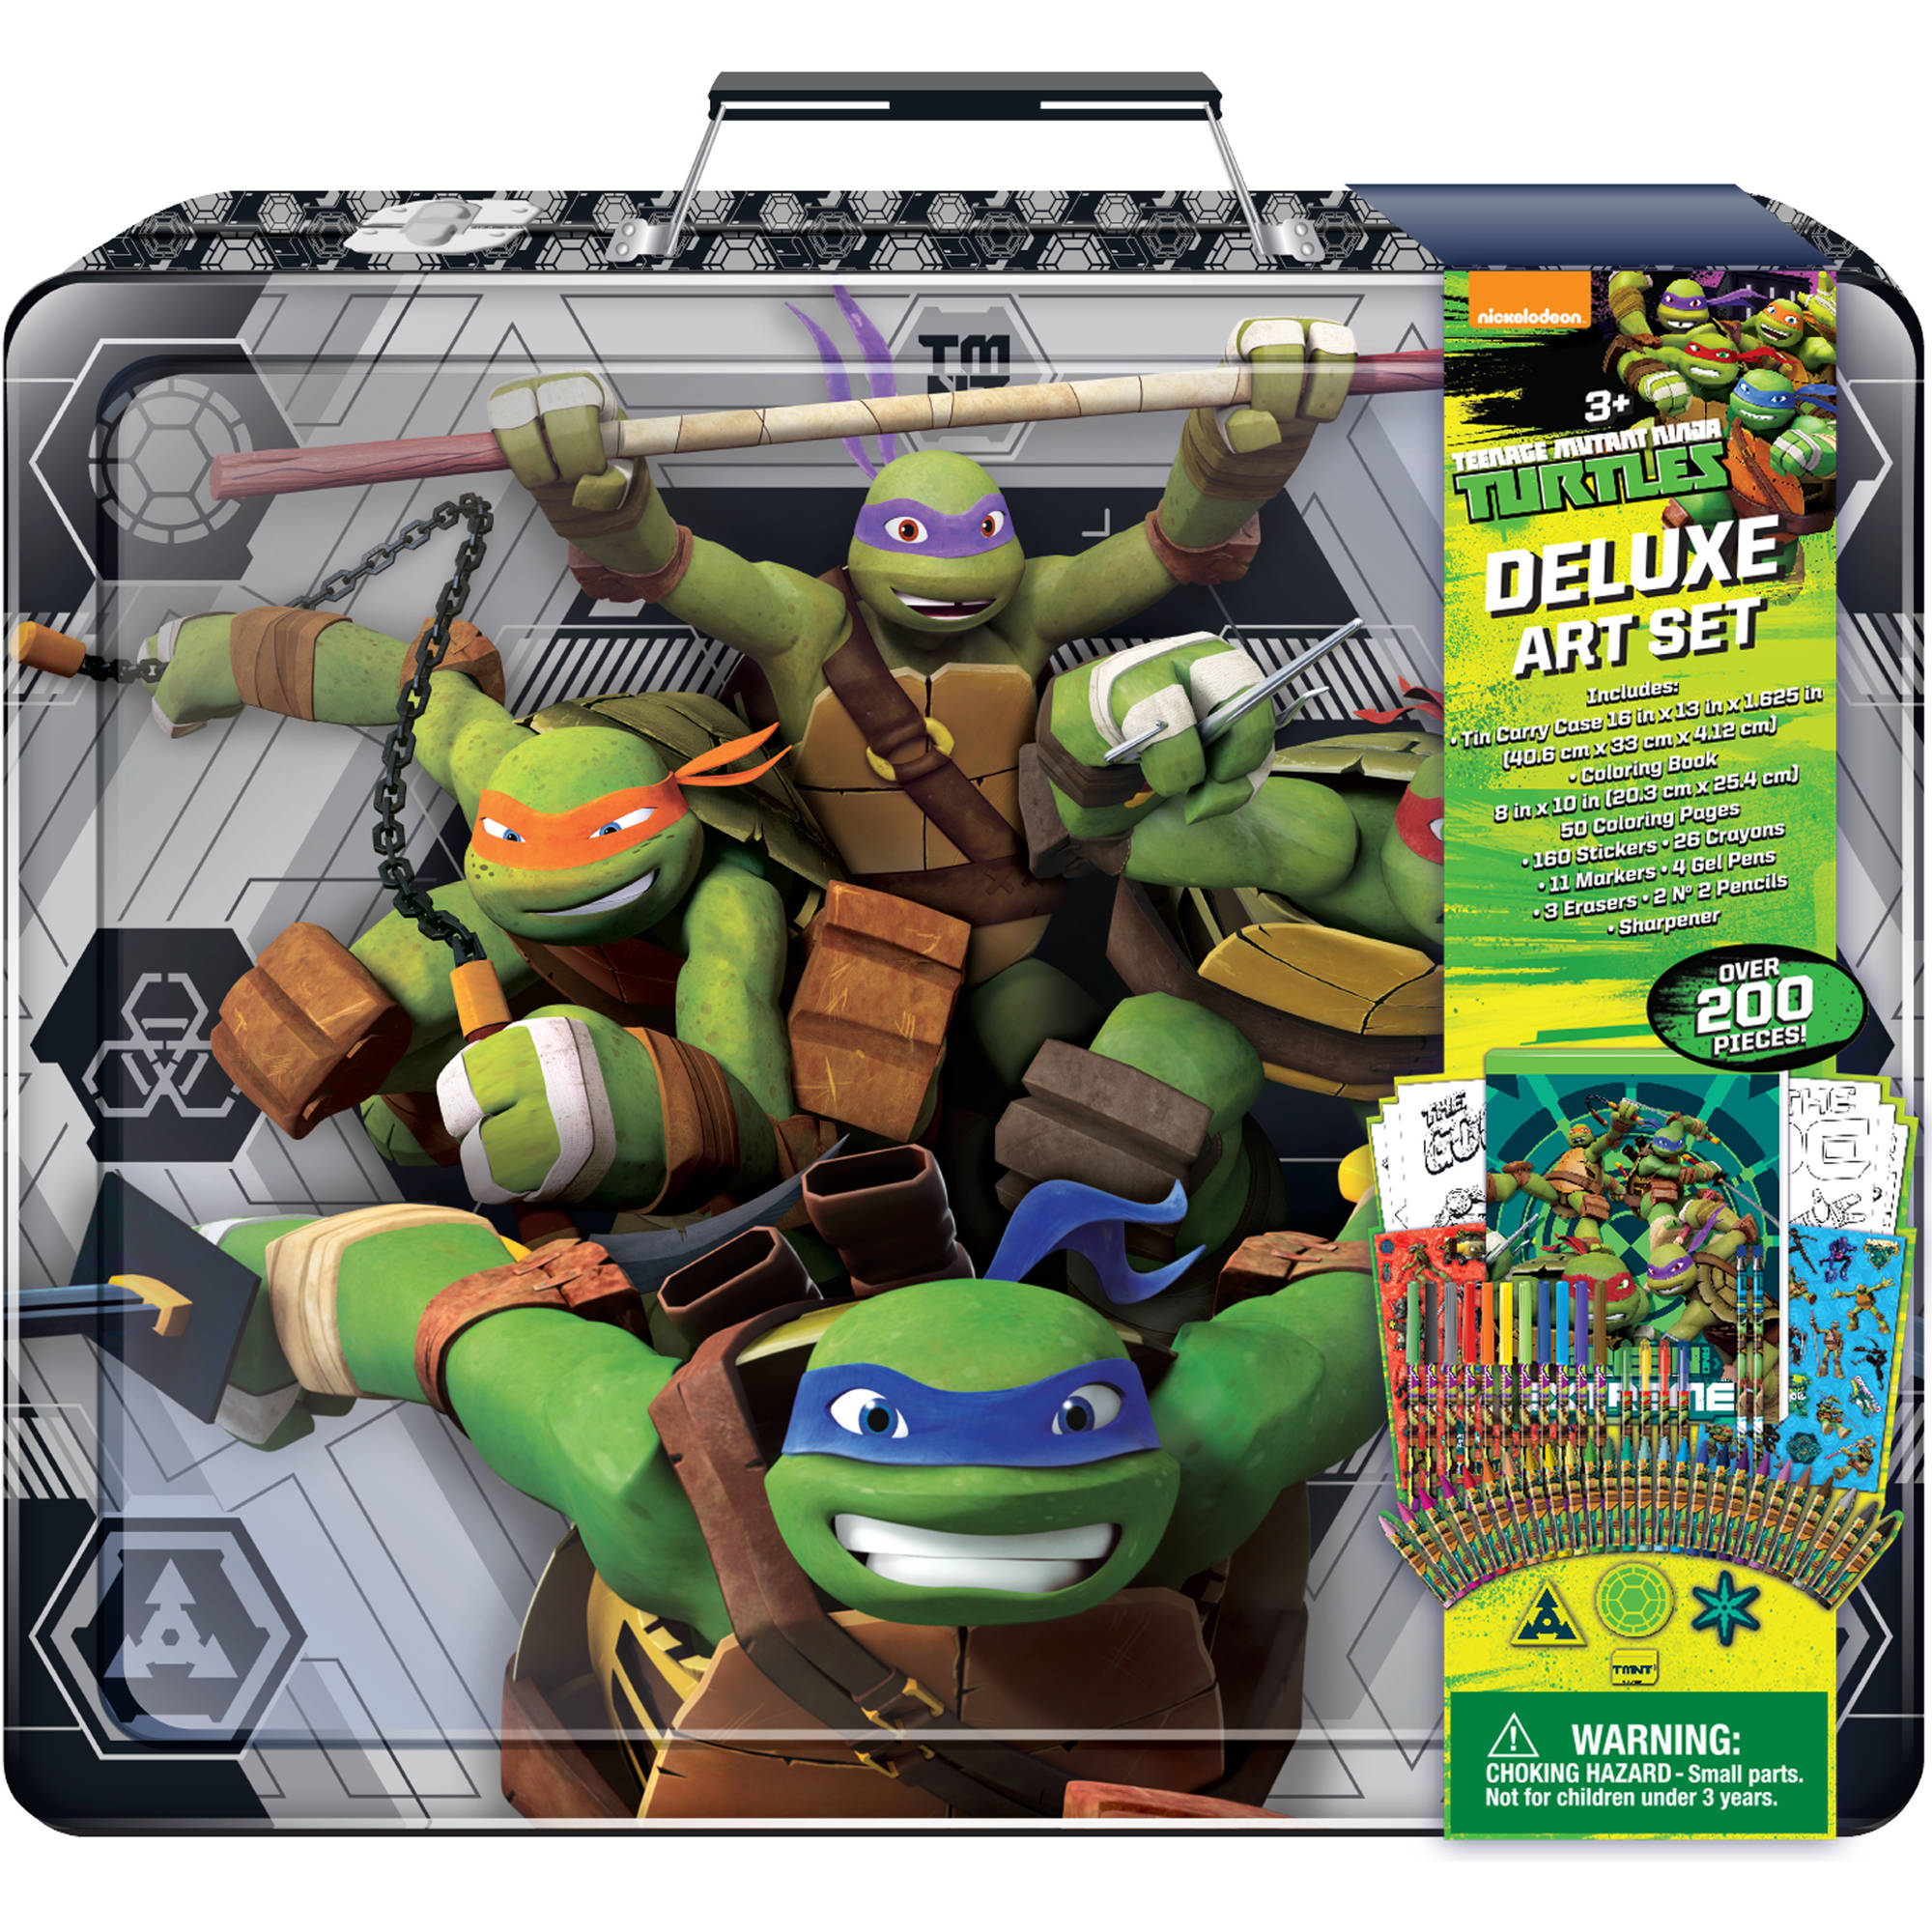 Teenage Mutant Ninja Turtles Deluxe Art Set - Walmart.com